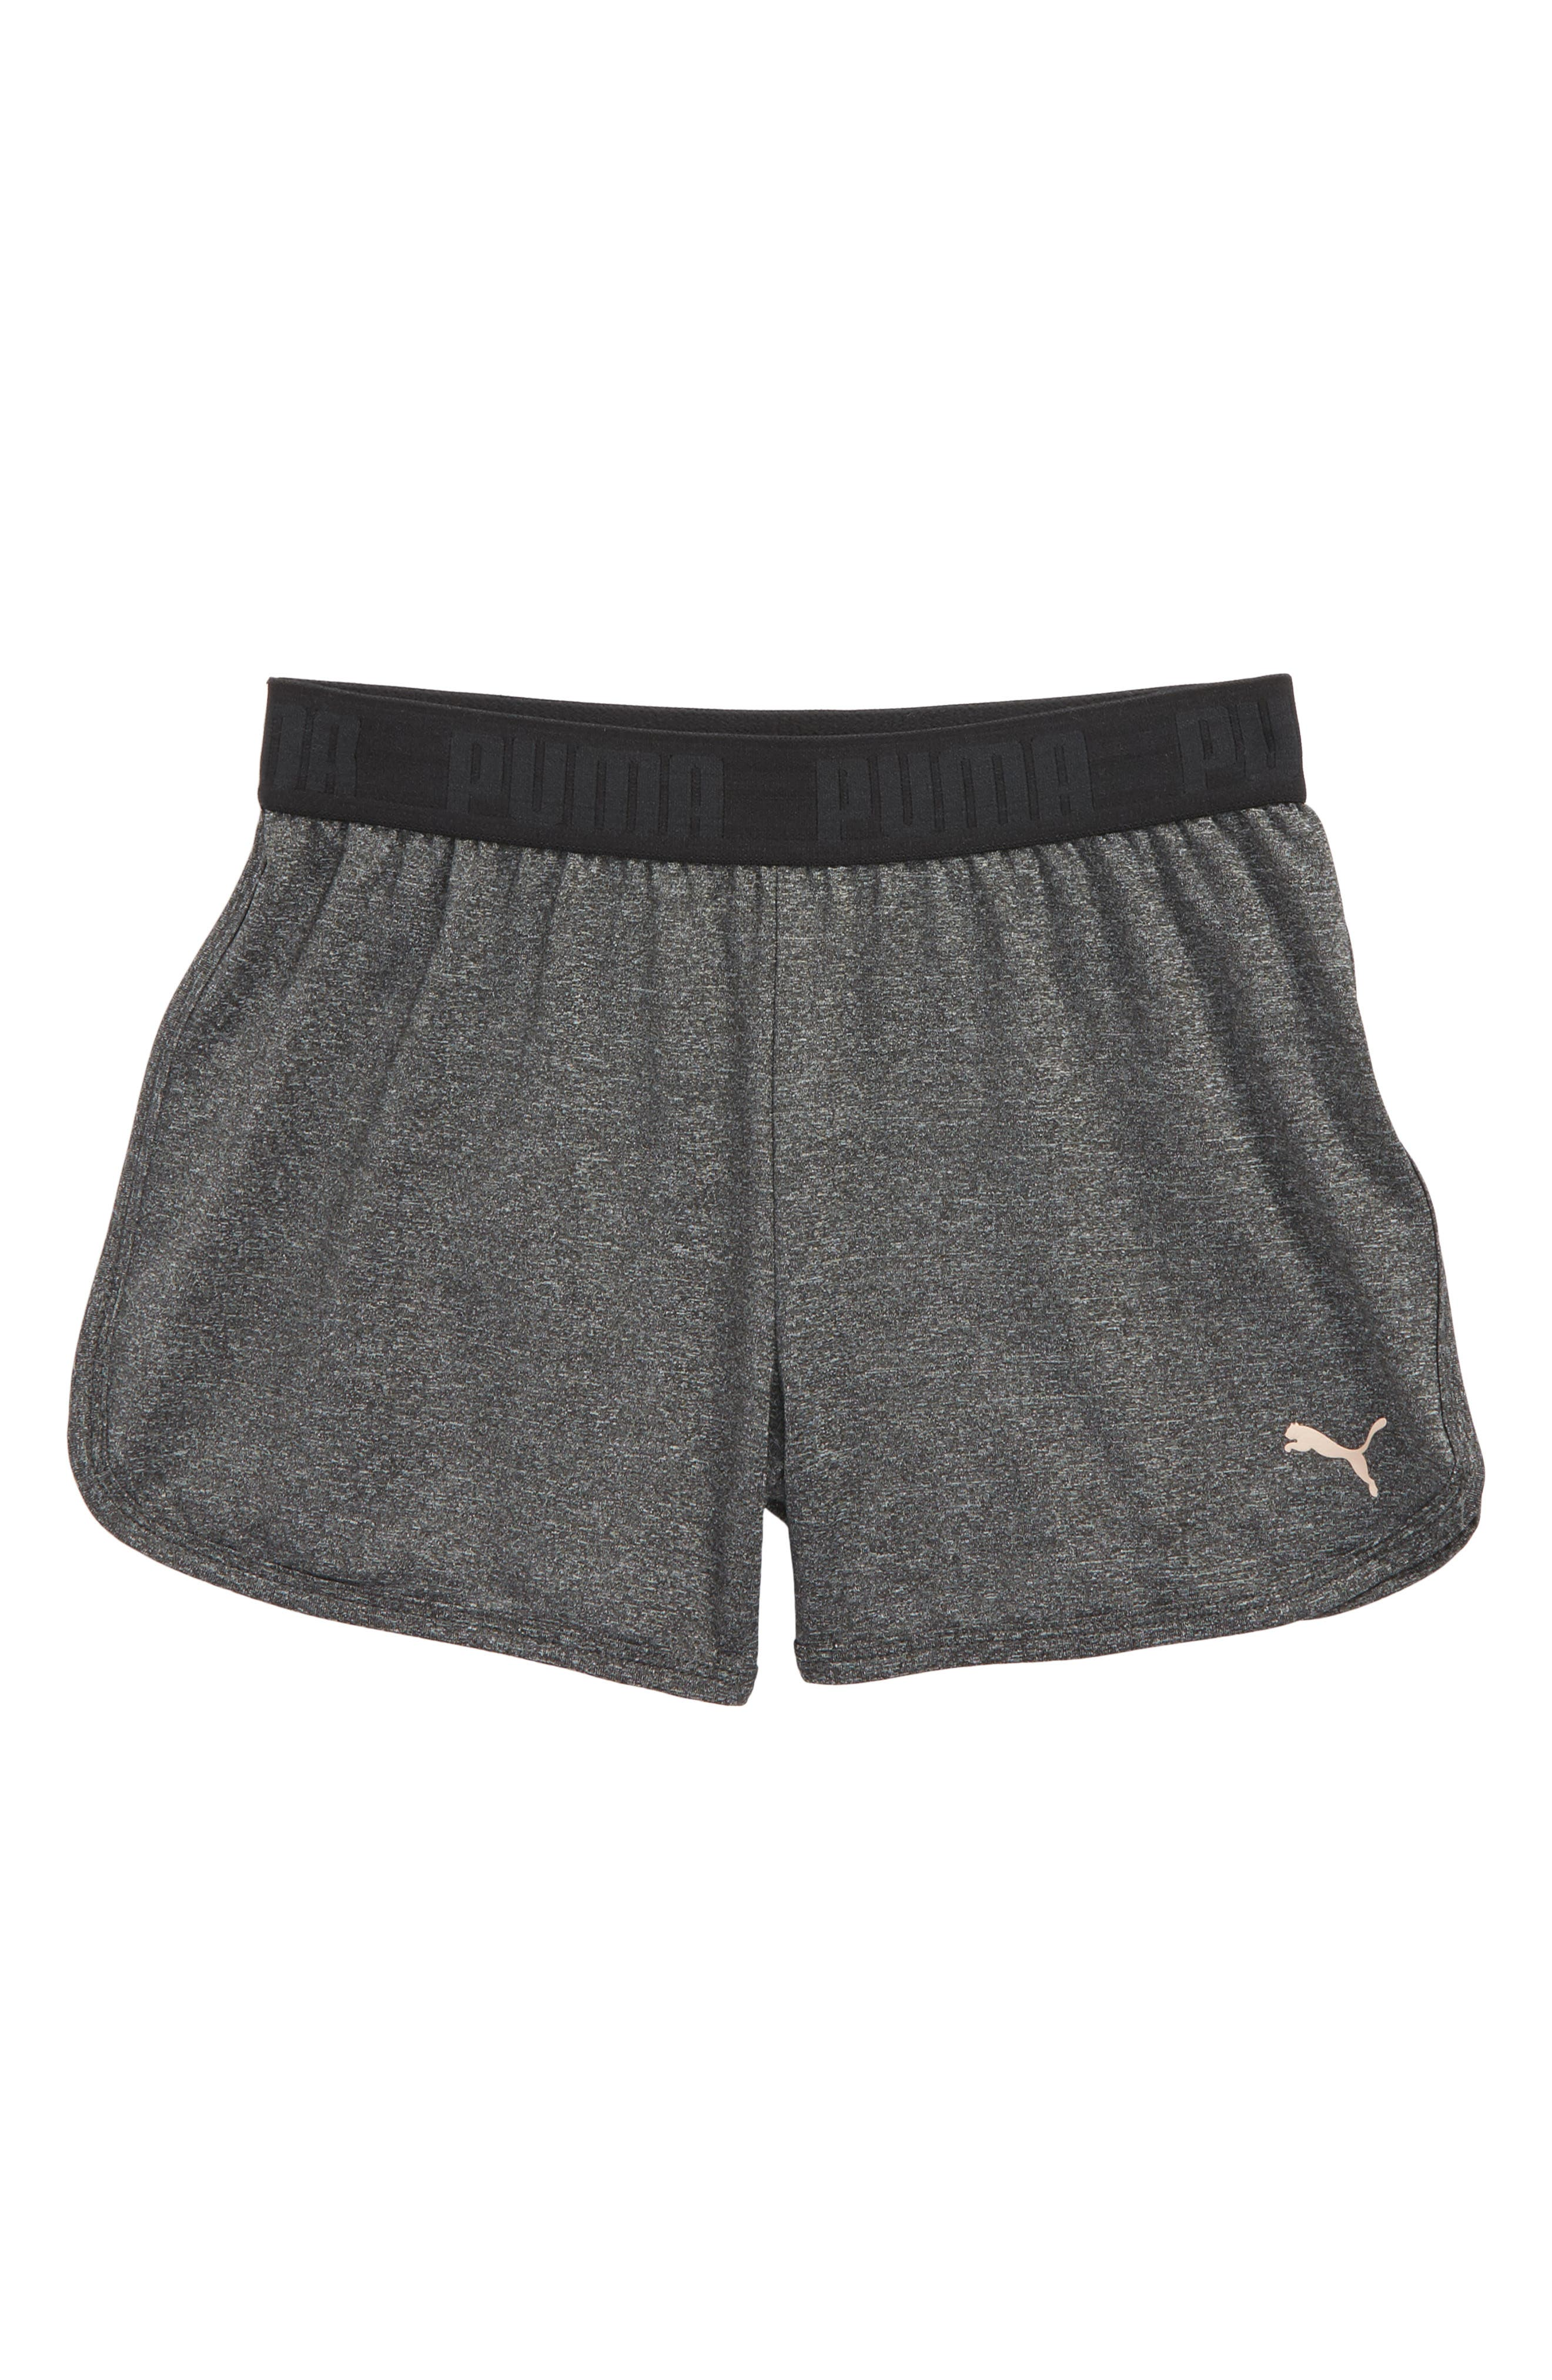 Logo Sport Shorts,                         Main,                         color, 020